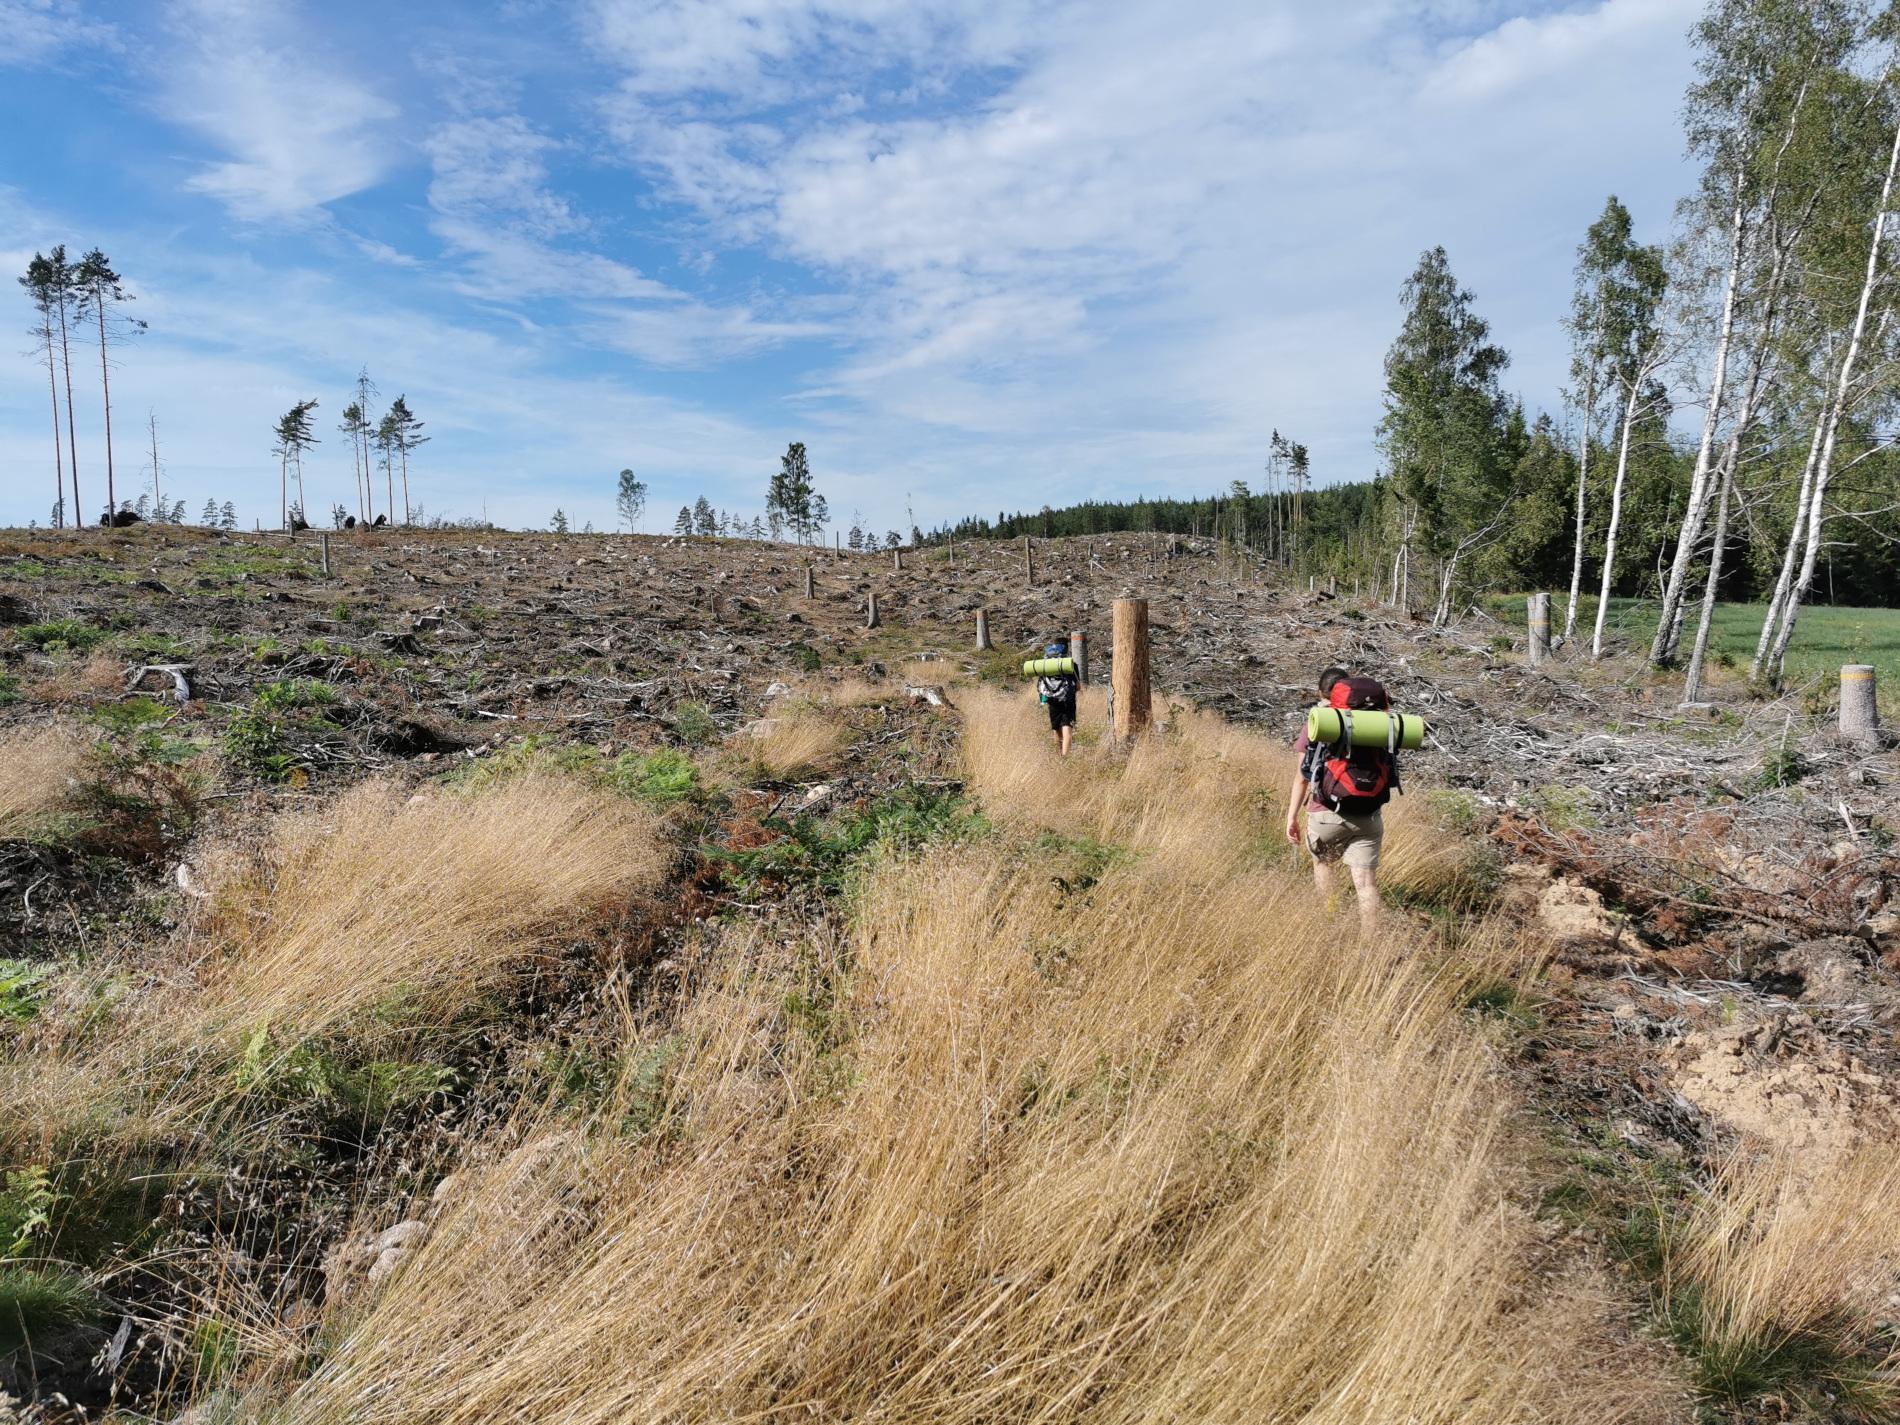 abgeholztes Gebiet auf dem Sörmlandsleden